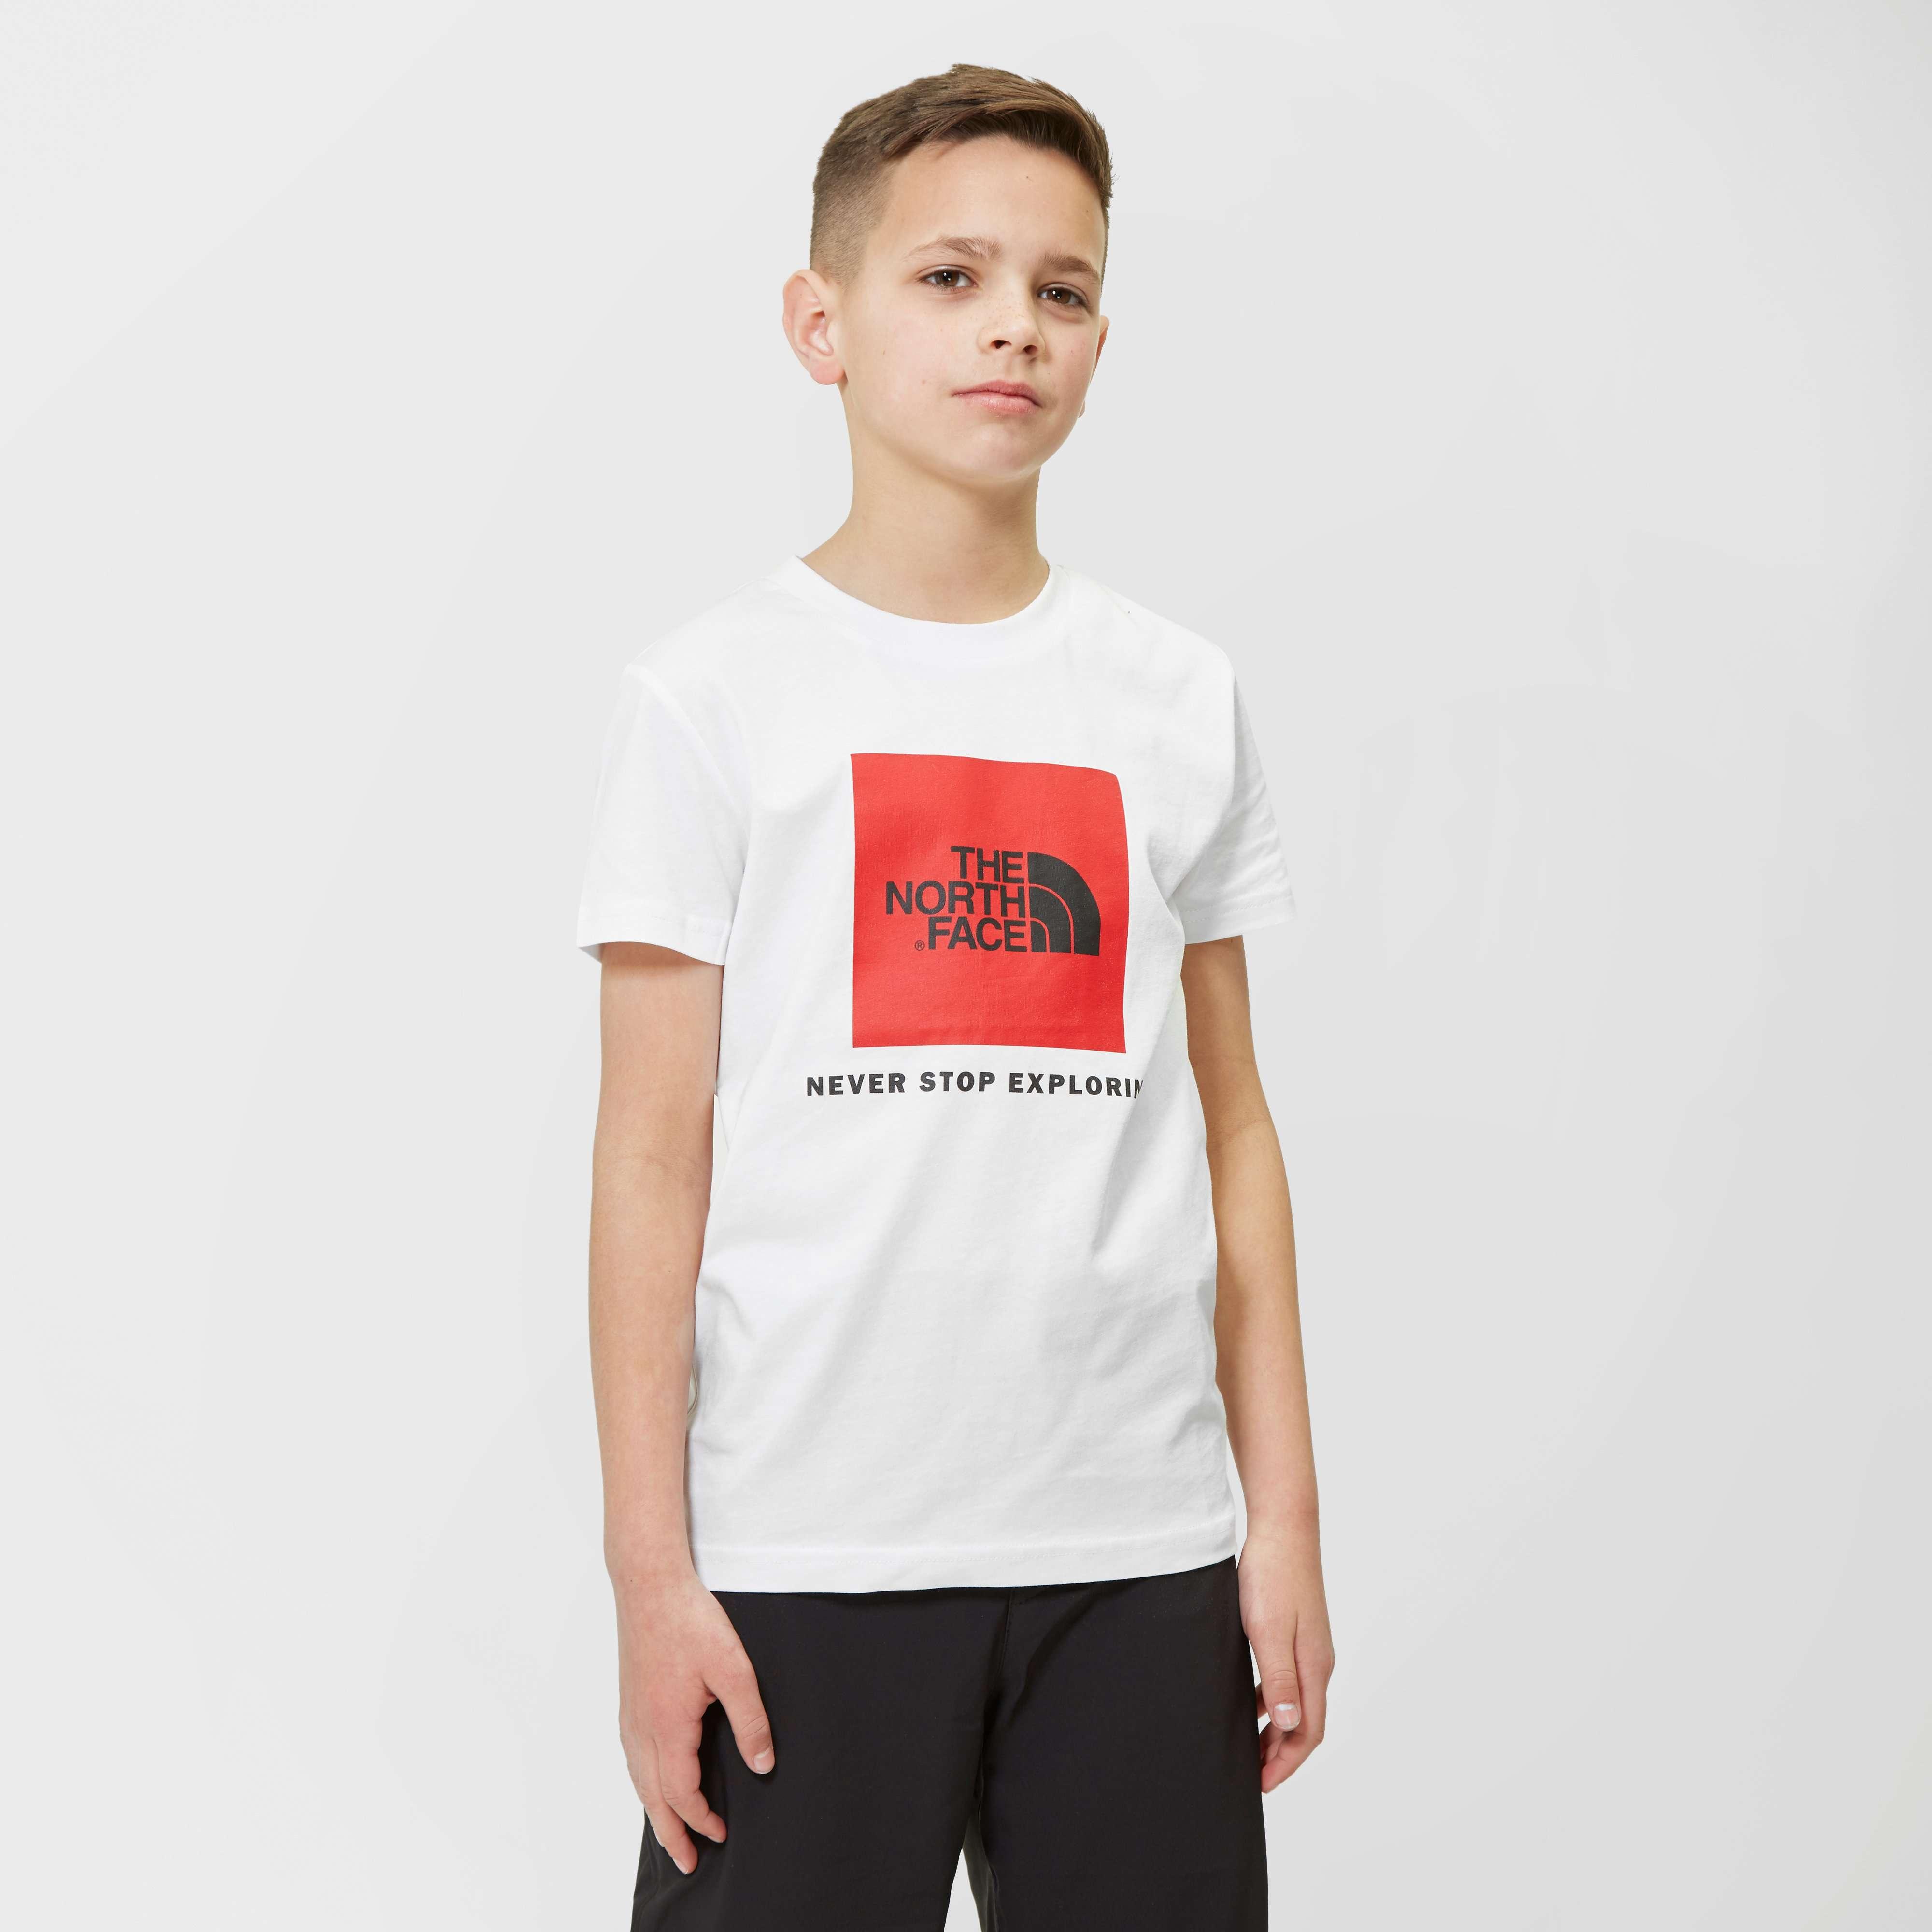 THE NORTH FACE Boys' Box T-shirt